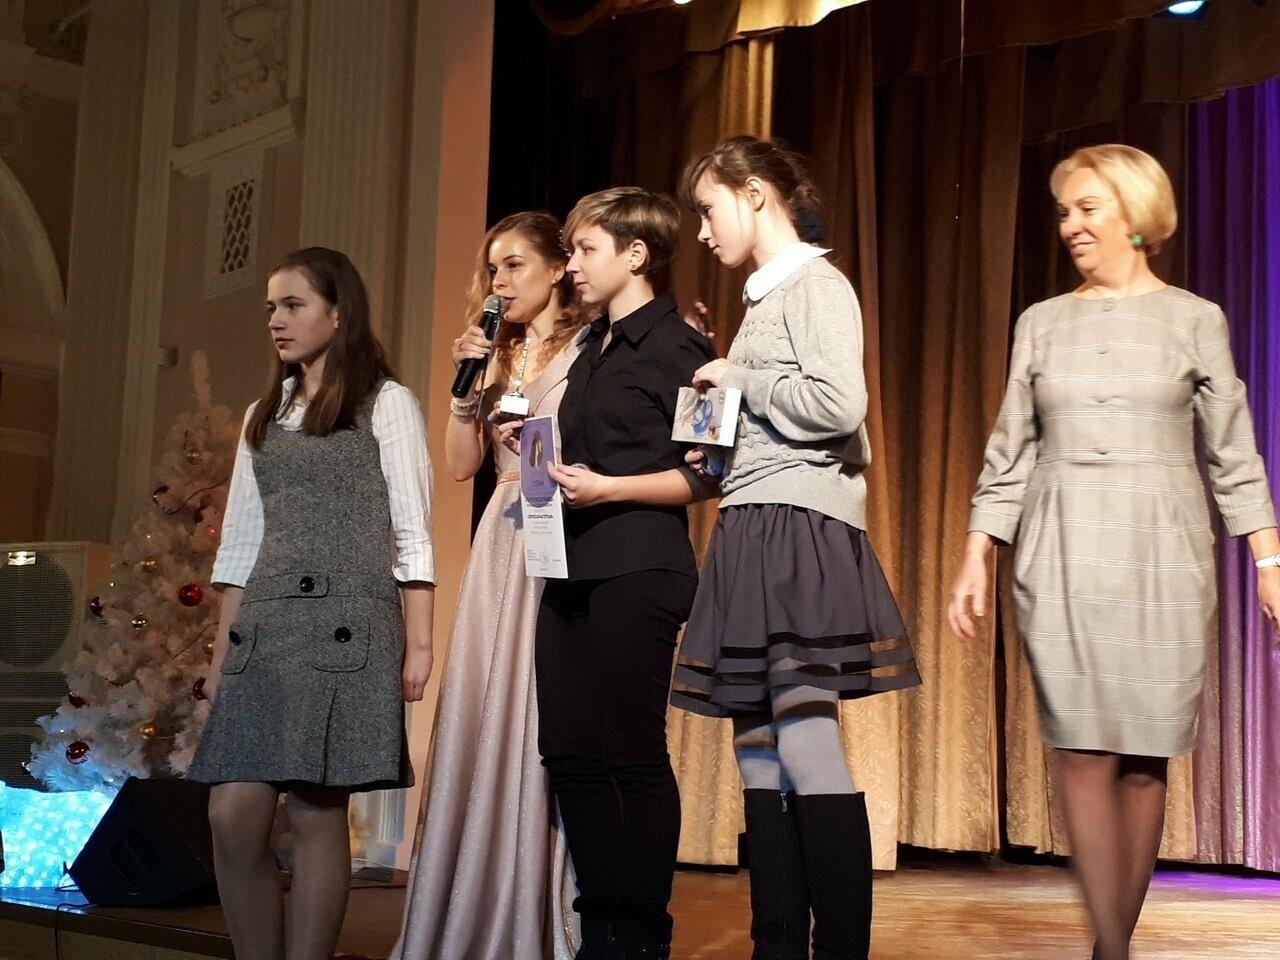 В Пушкинском доме культуры подвели итоги конкурса «Творчество без границ», фото-3